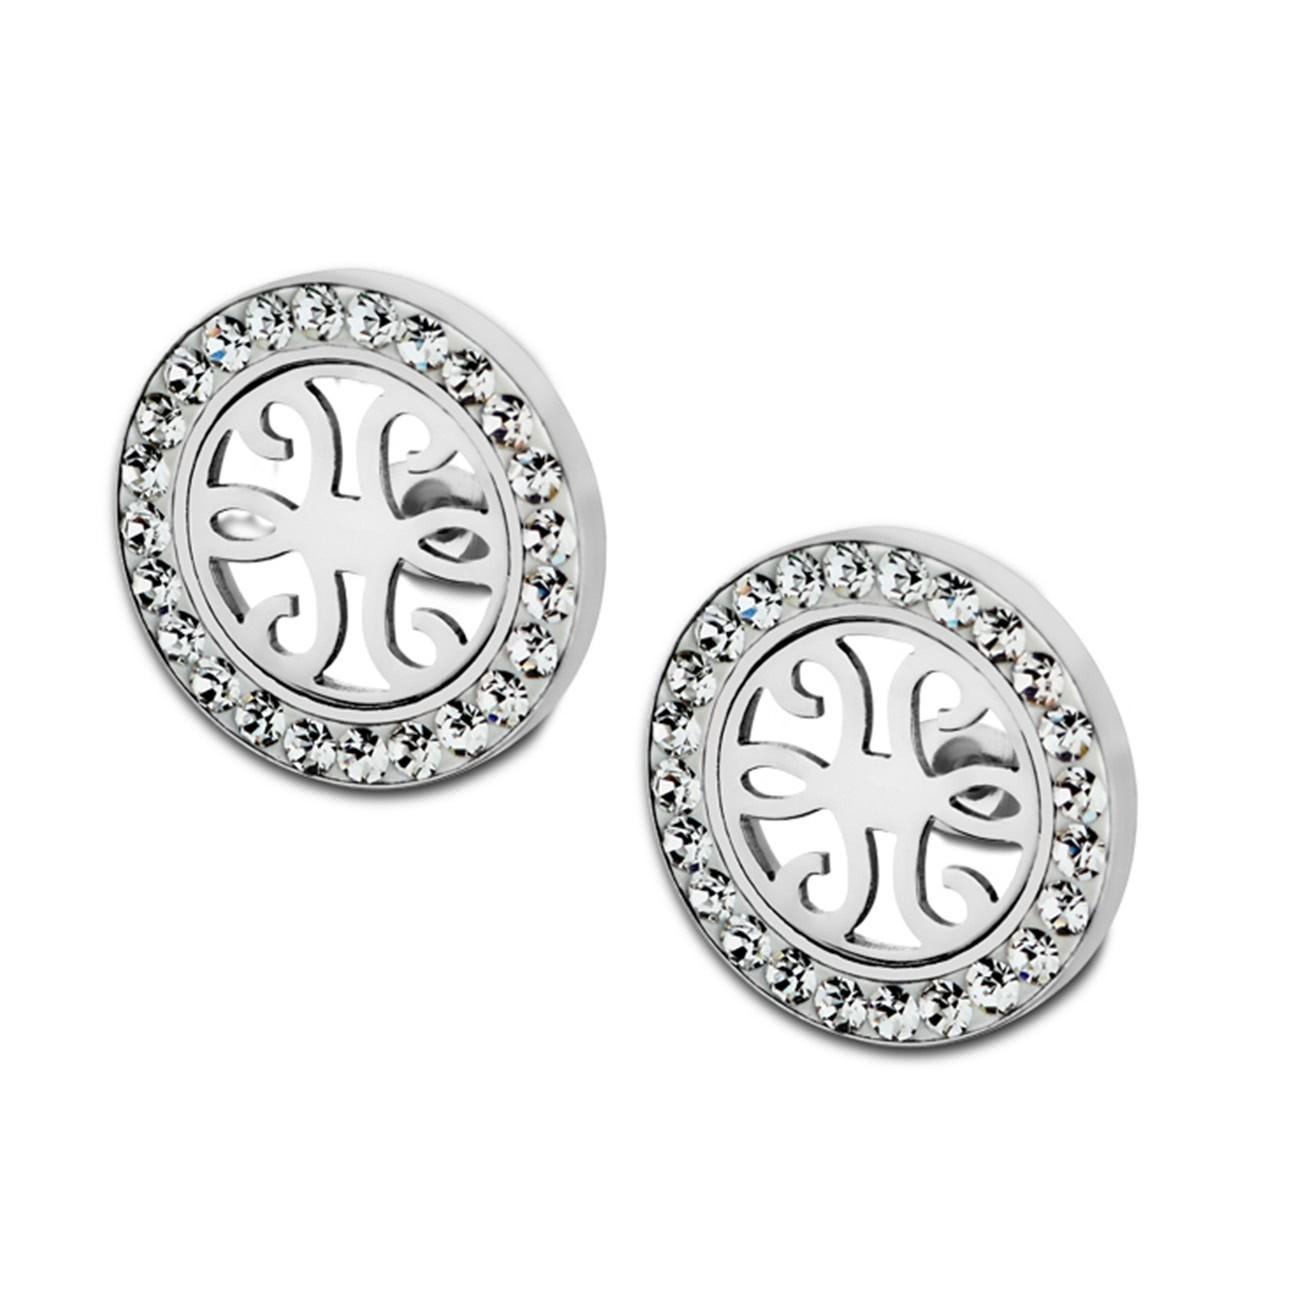 LOTUS Style Ohrringe Damen Edelstahl silber LS1779-4/1 Ohrstecker JLS1779-4-1